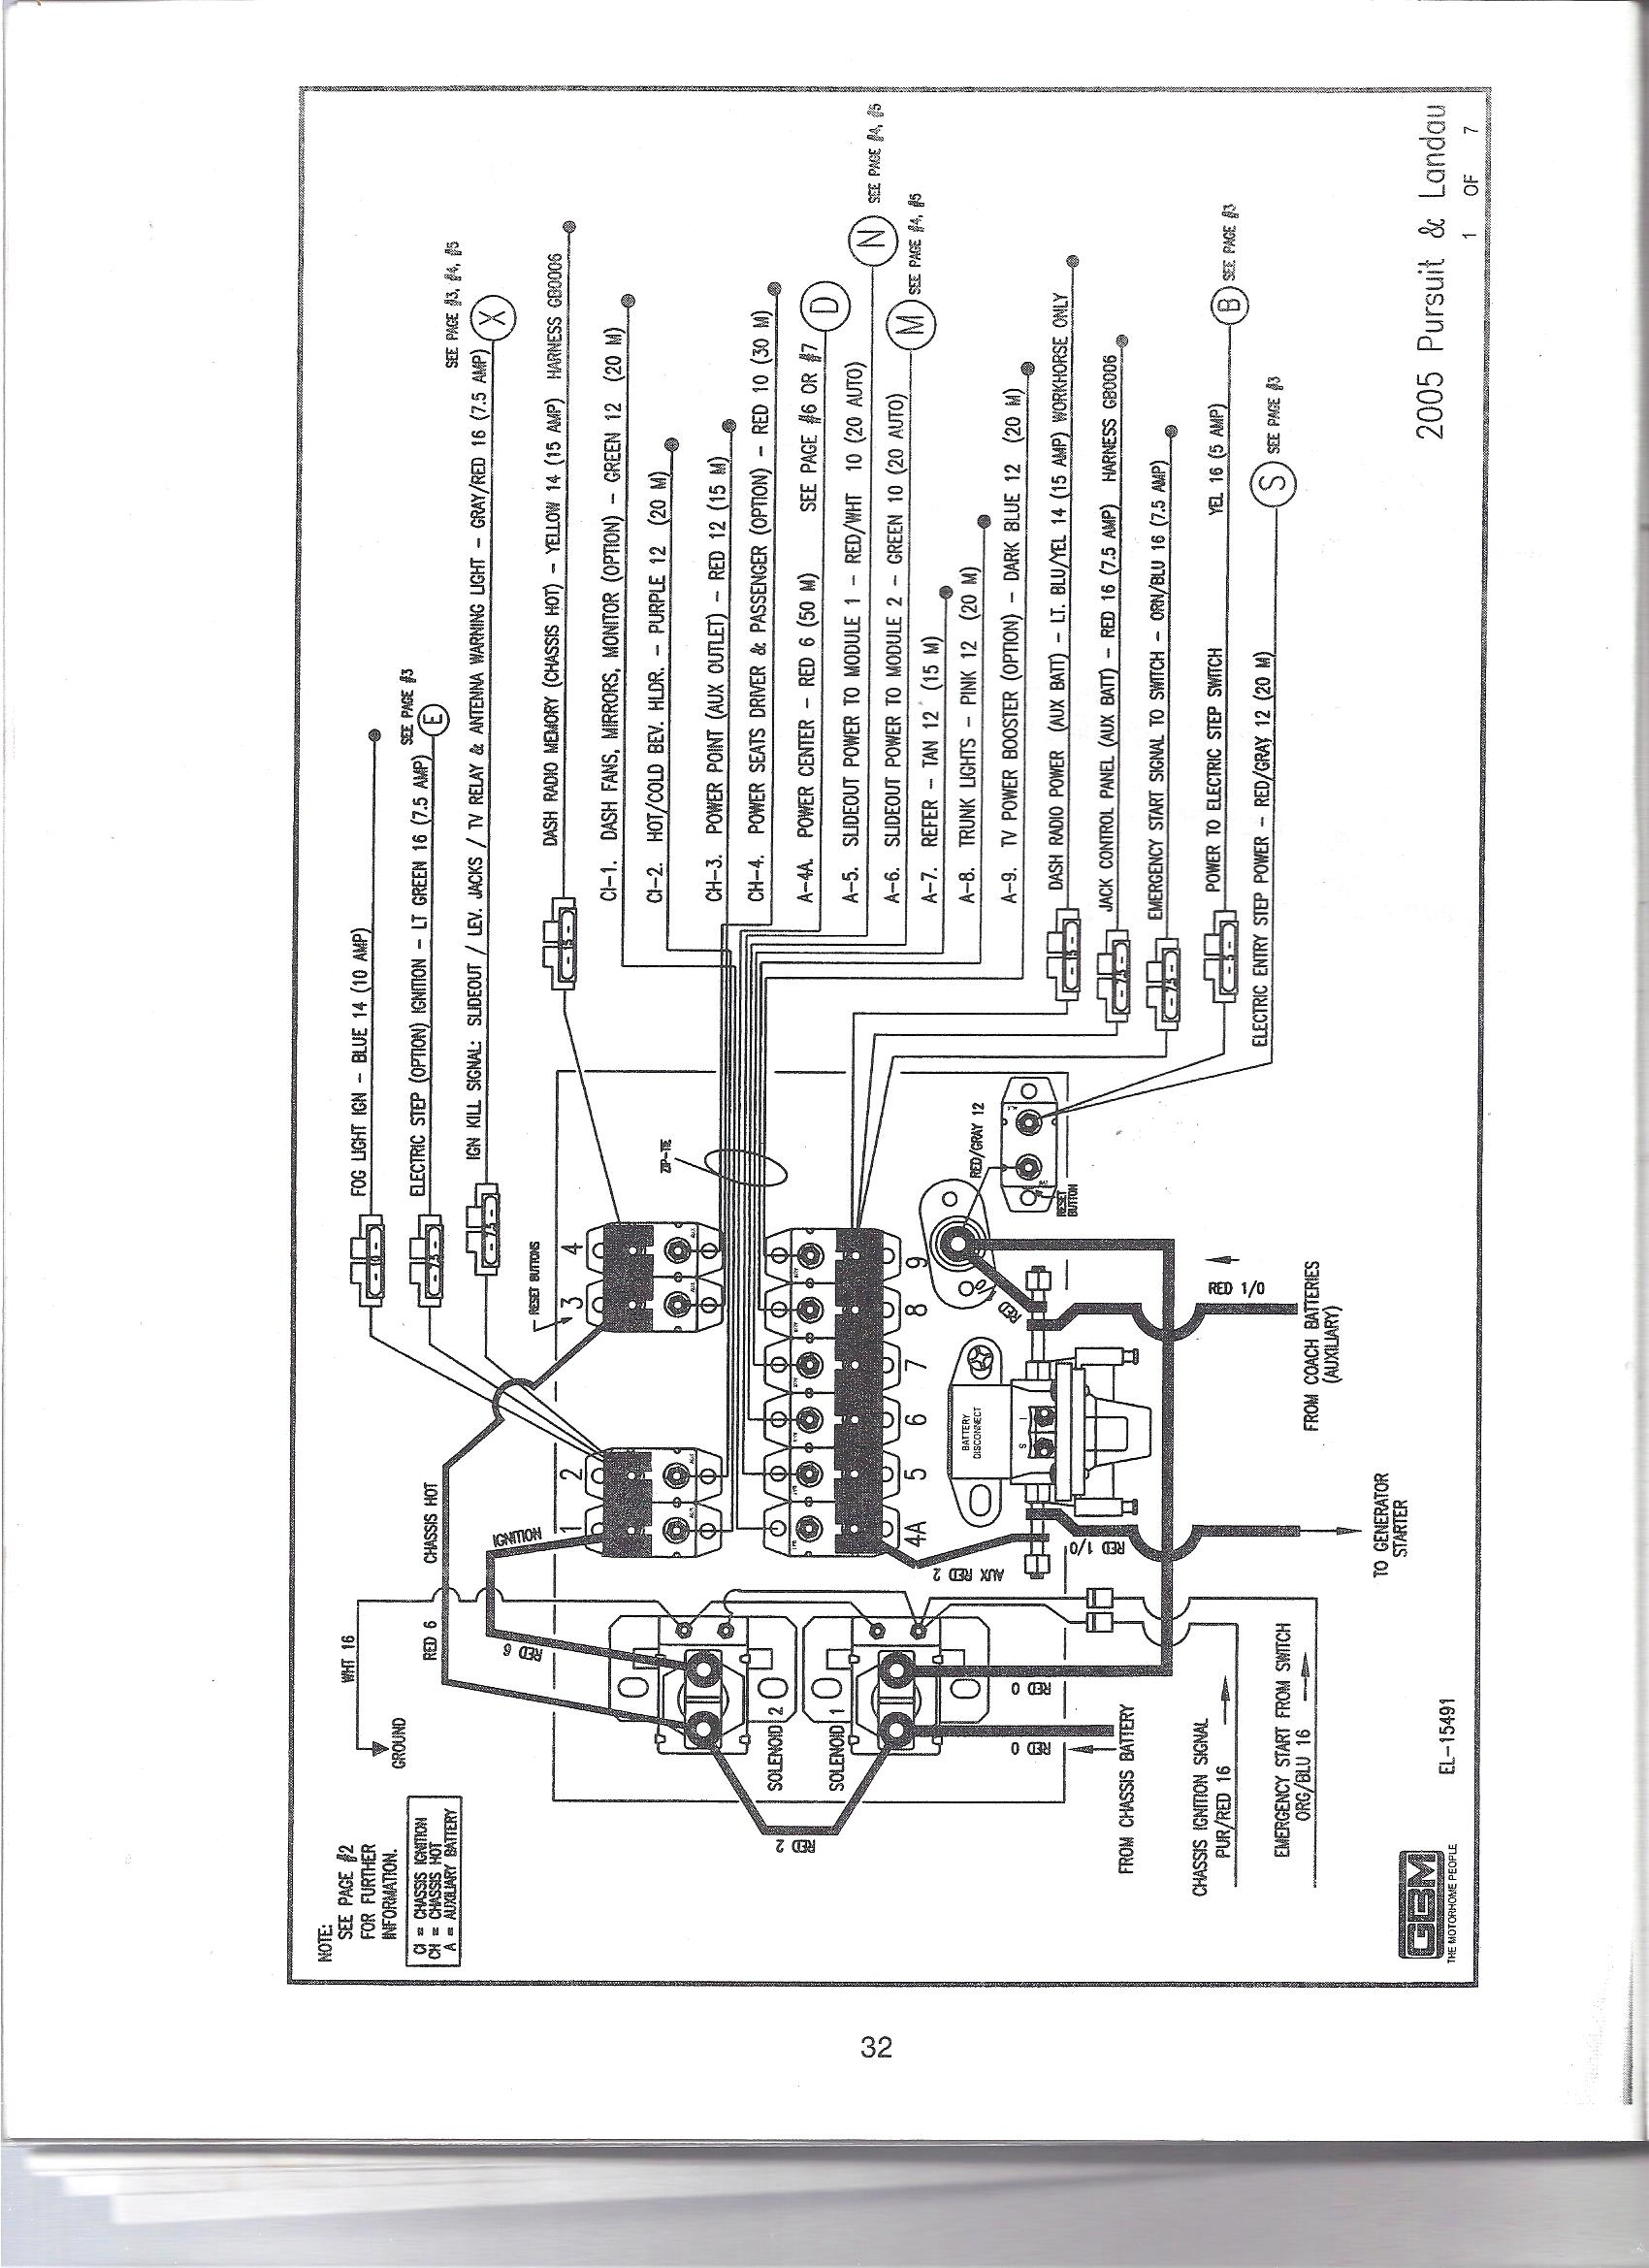 fleetwood rv wiring diagrams 7 pin trailer diagram flat for 1990 georgie boy motorhome get